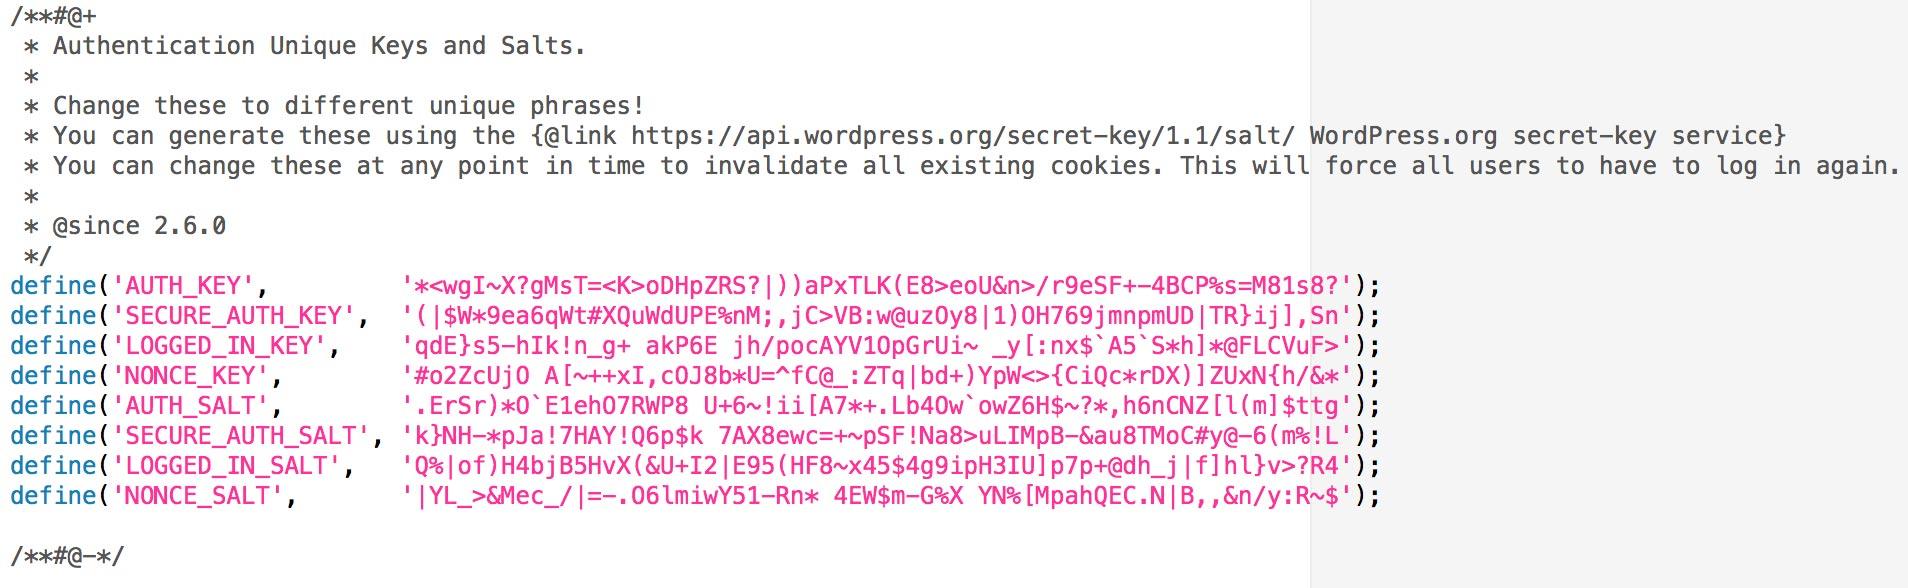 Add Keys to wpconfig.php